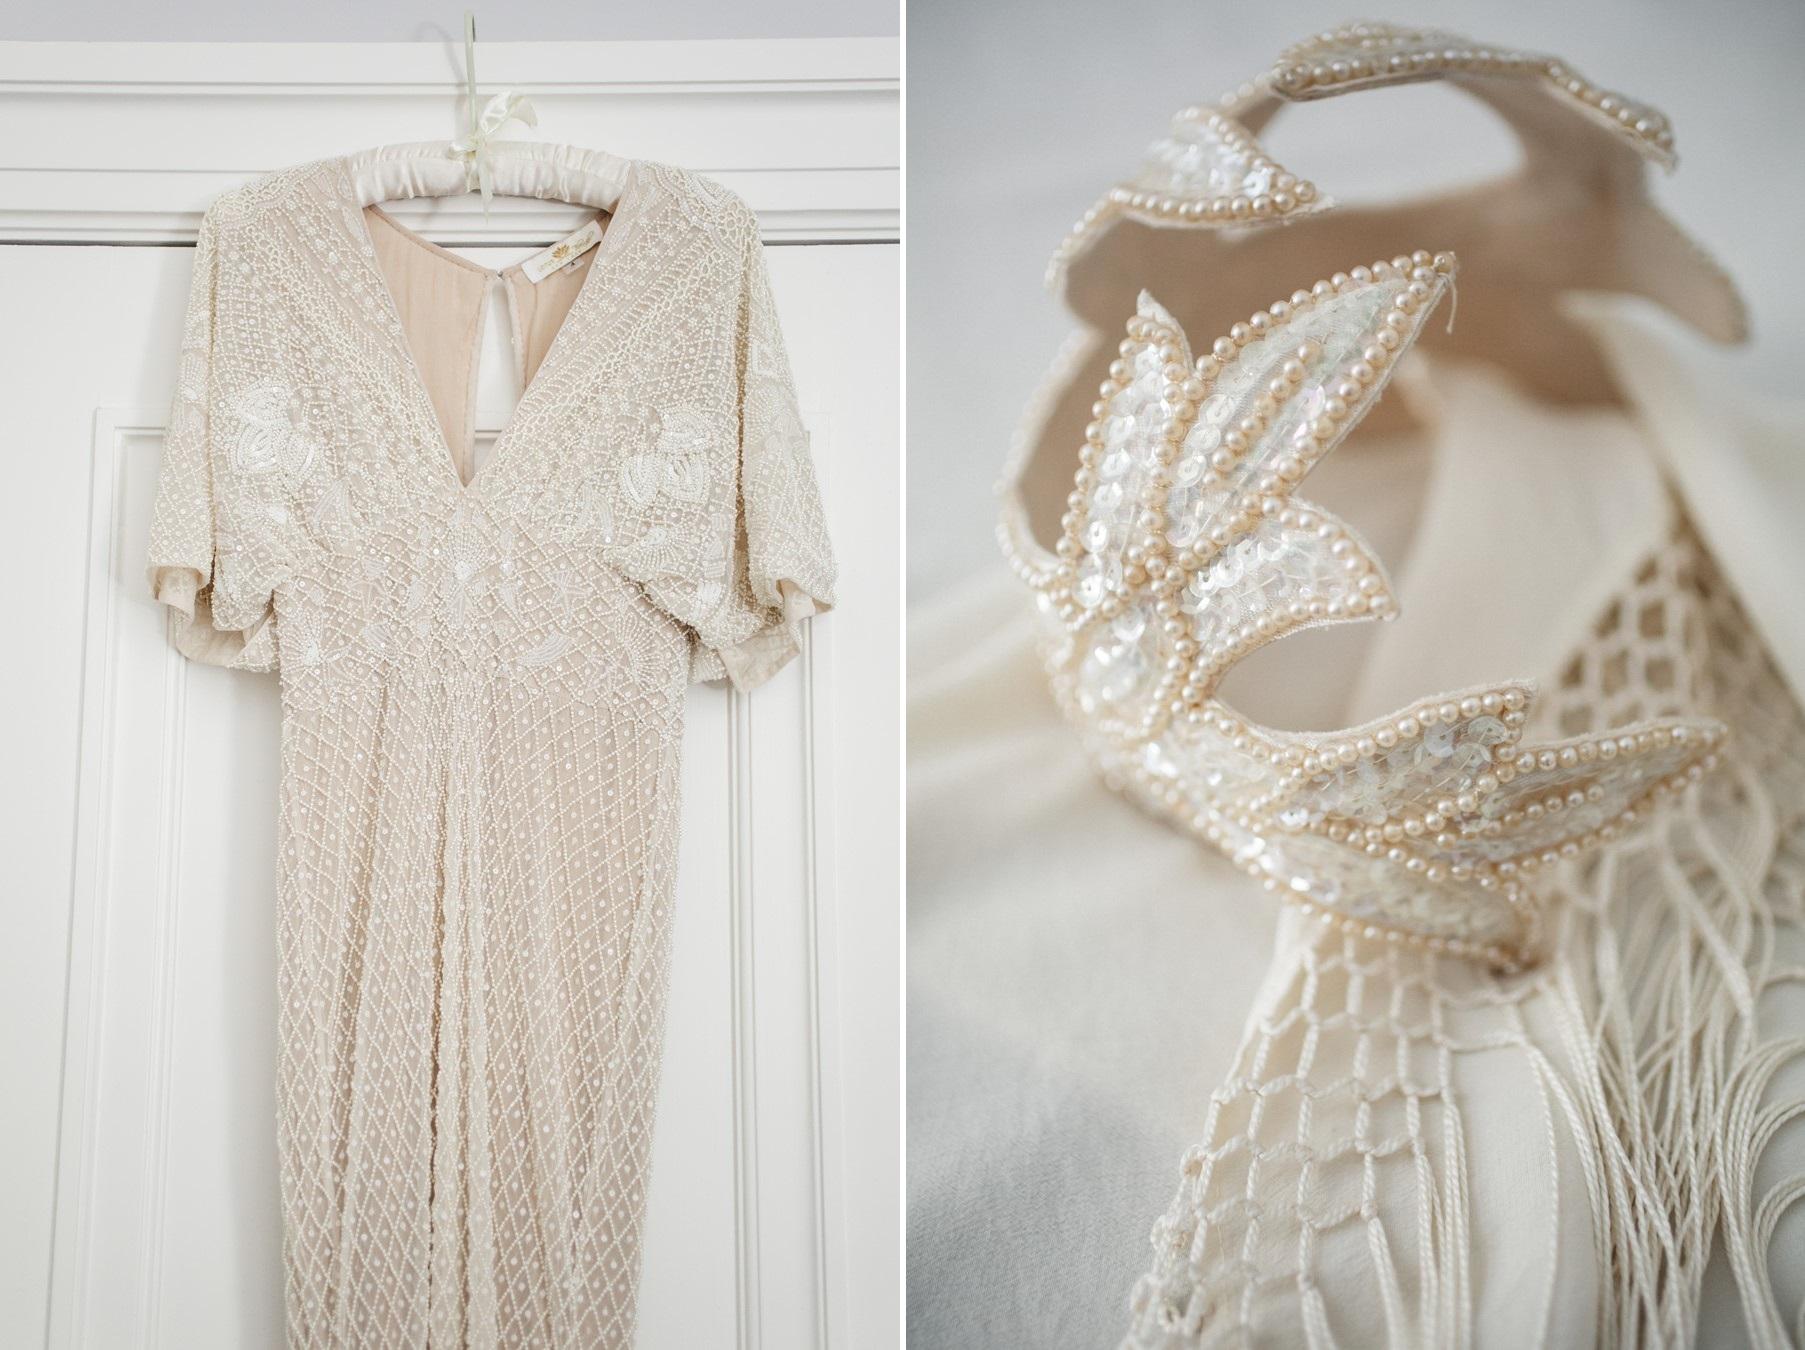 Vintage Wedding Dress & Headpiece